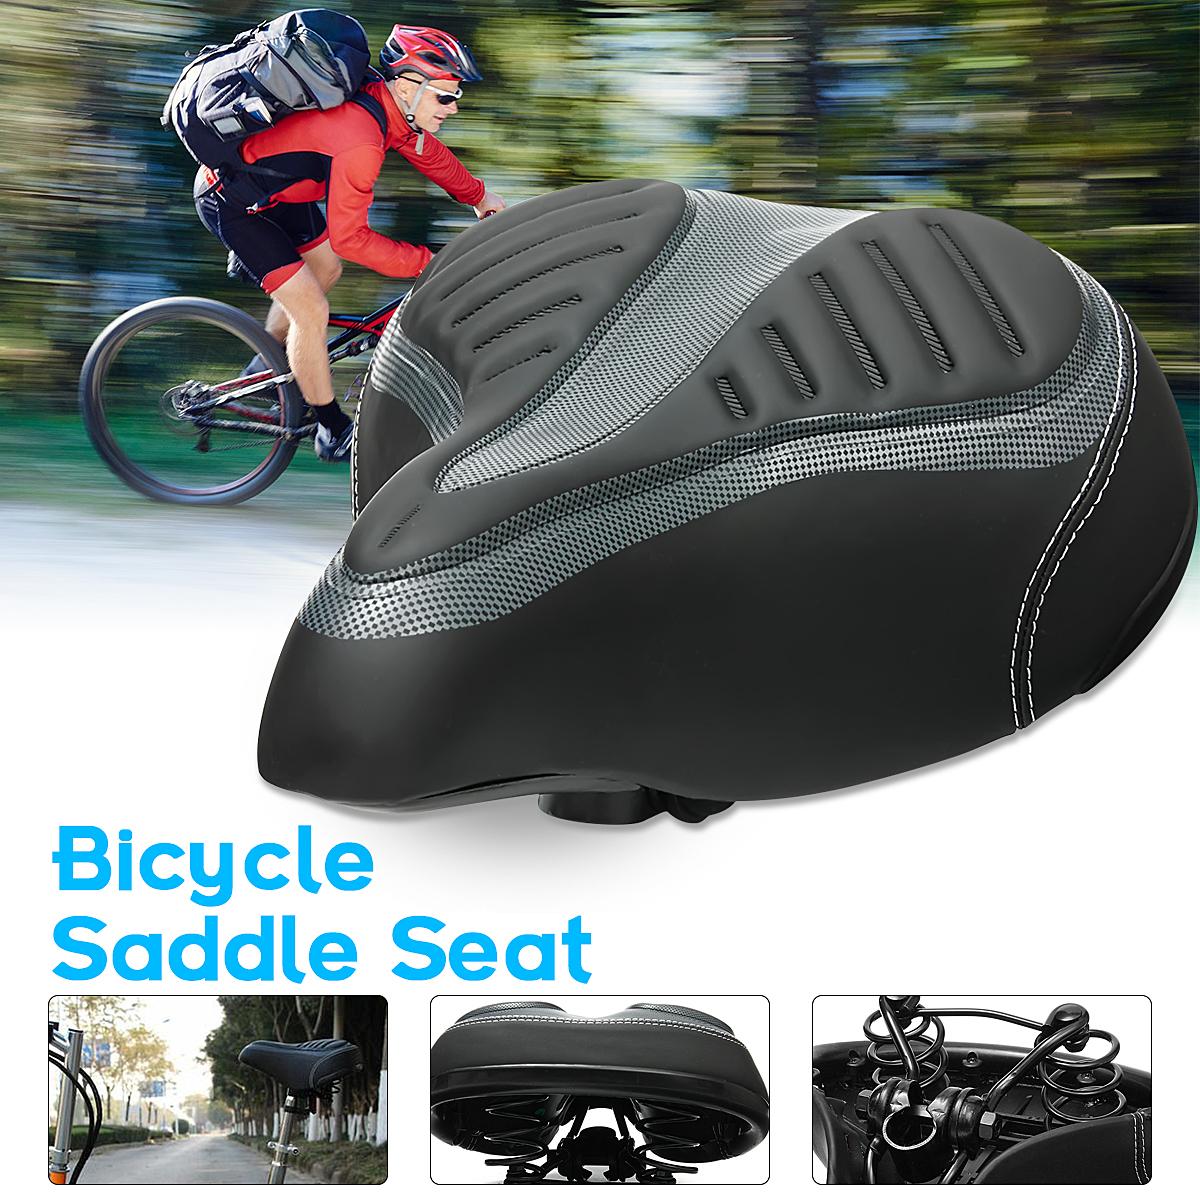 Cycling Bike Seat Wide Big Bum Saddle Seat Mountain Bike Bicycle Comfortable & Soft Cushion Pad Sports